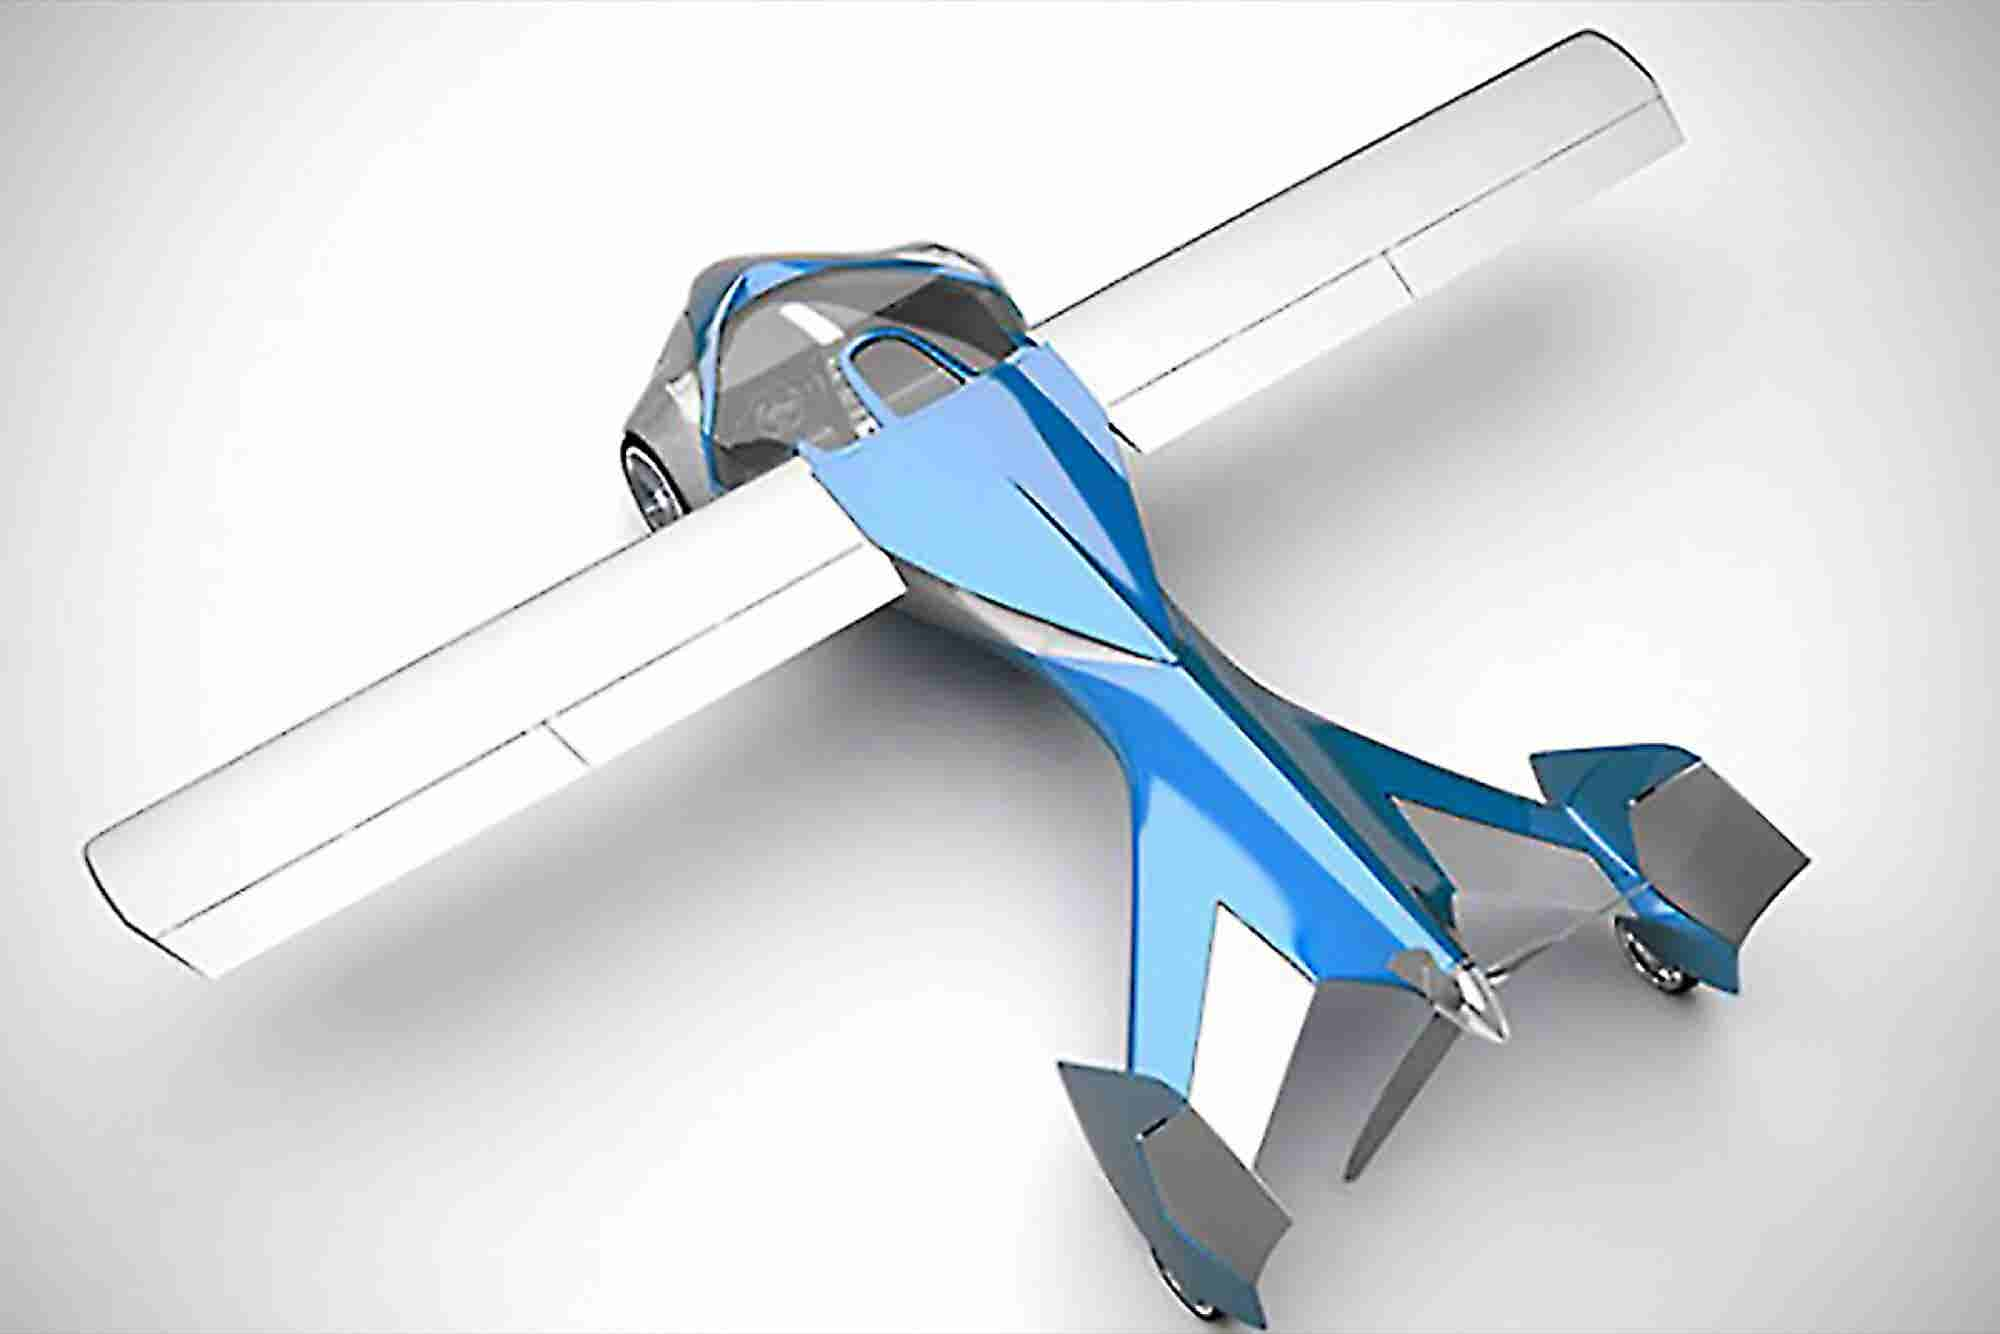 It's a Bird. It's a Plane. No, It's a Flying Car (Finally)!